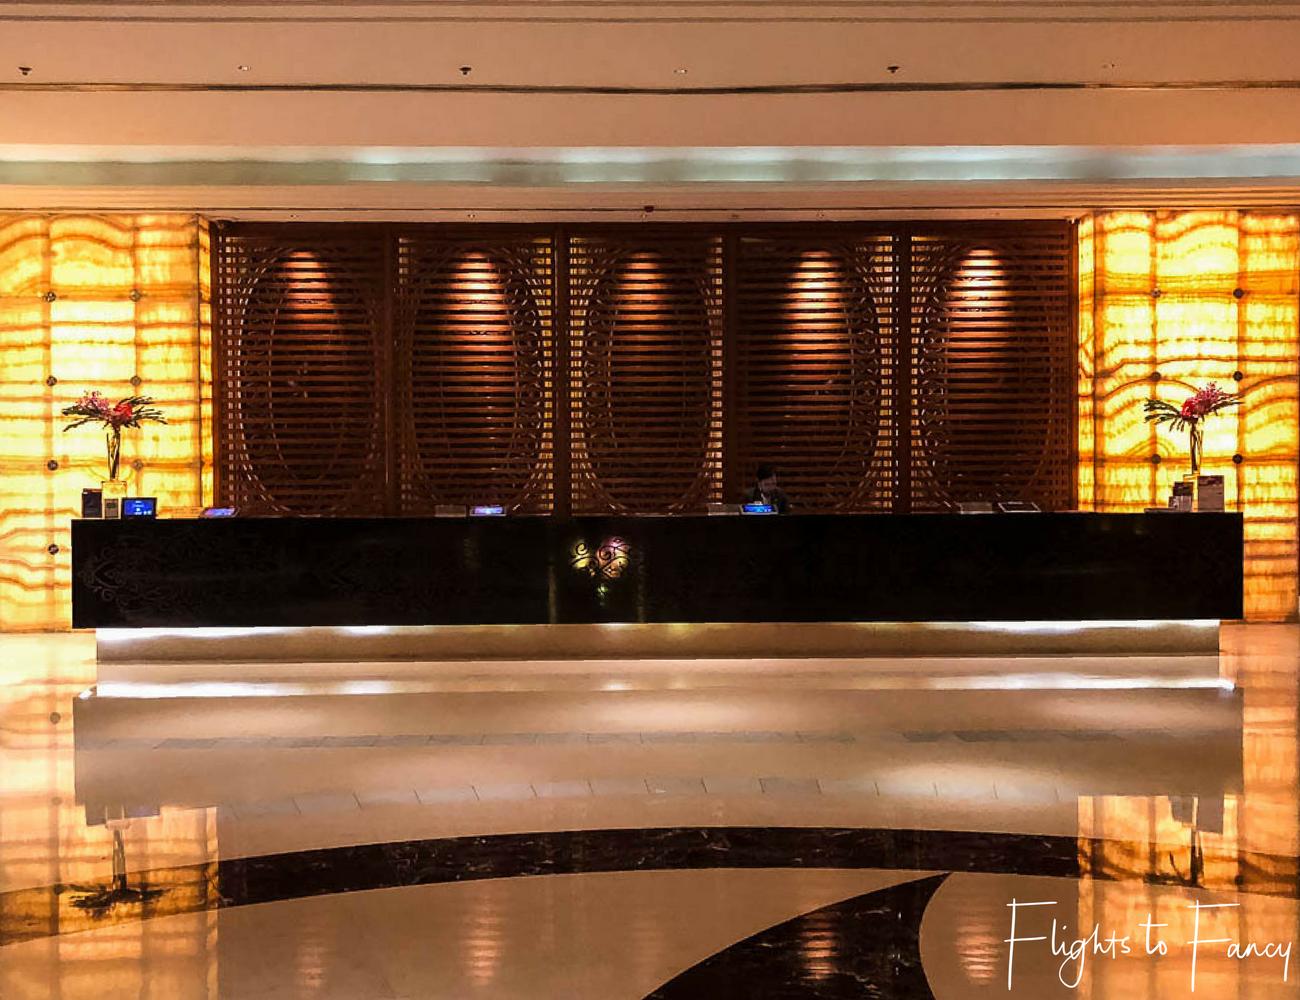 Radisson Blu Cebu: The Best Hotel Near SM Cebu City